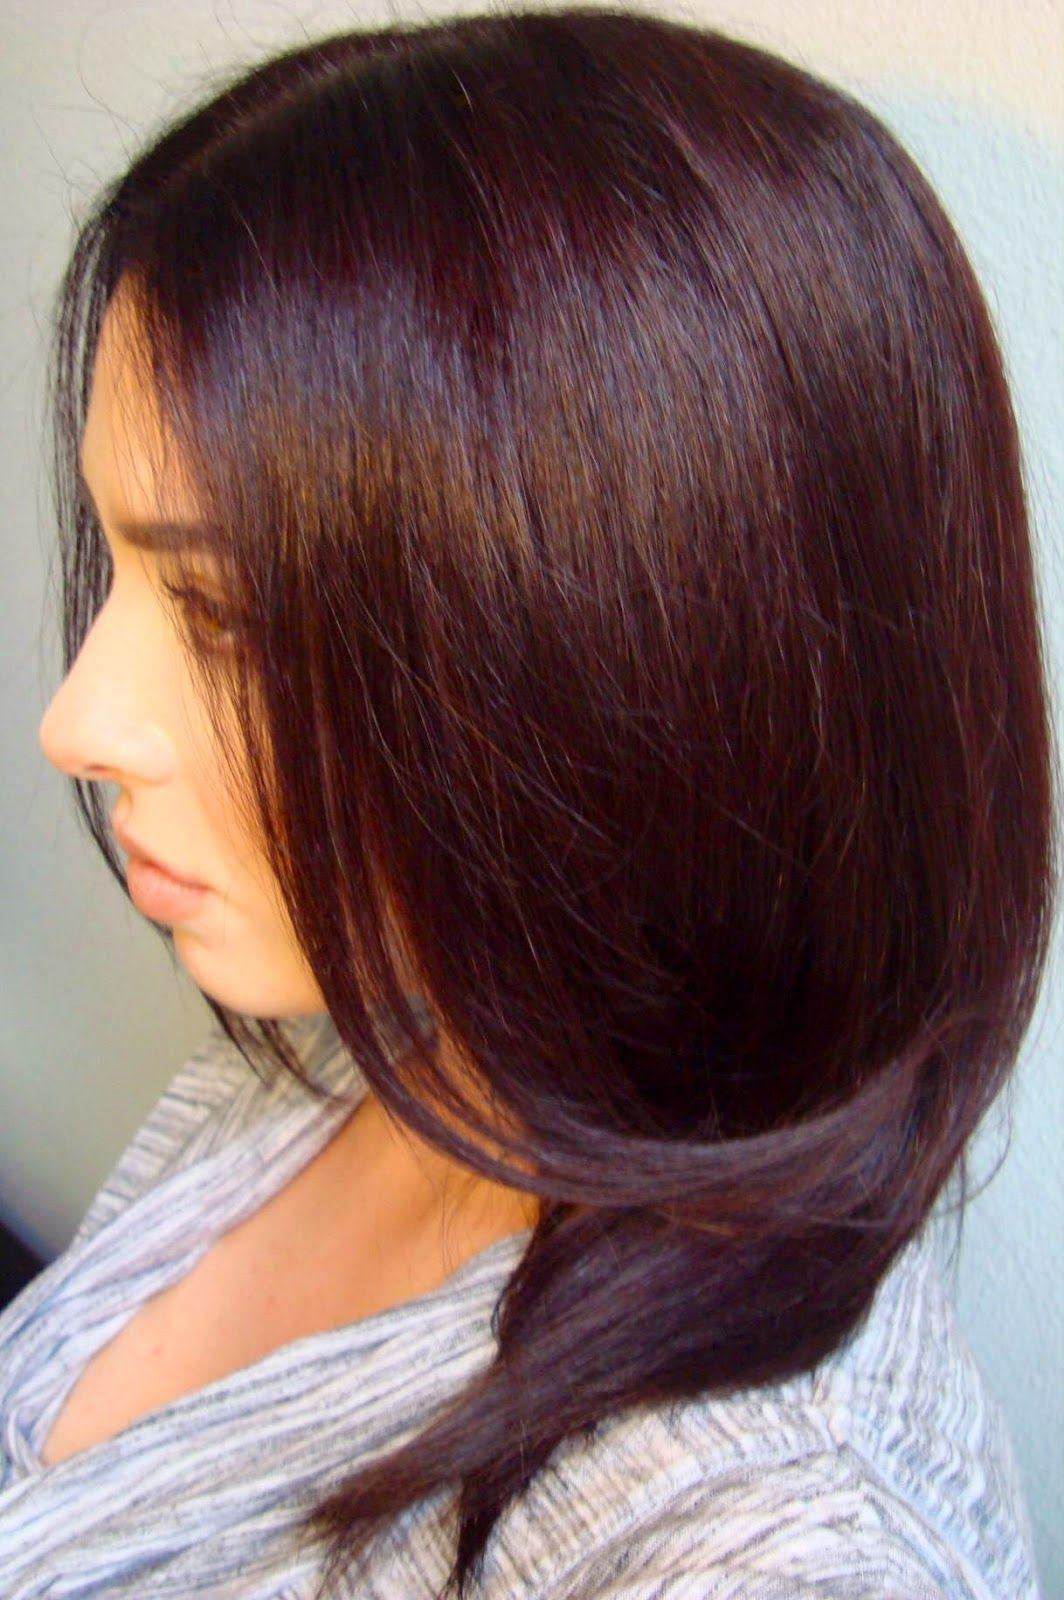 Home Hair Dye Red Brown Hair Color Going Dark Hair Sallys Box Purple Diy Jpg 1064 1600 Hair Color Mahogany Mahogany Brown Hair Hair Color Chart